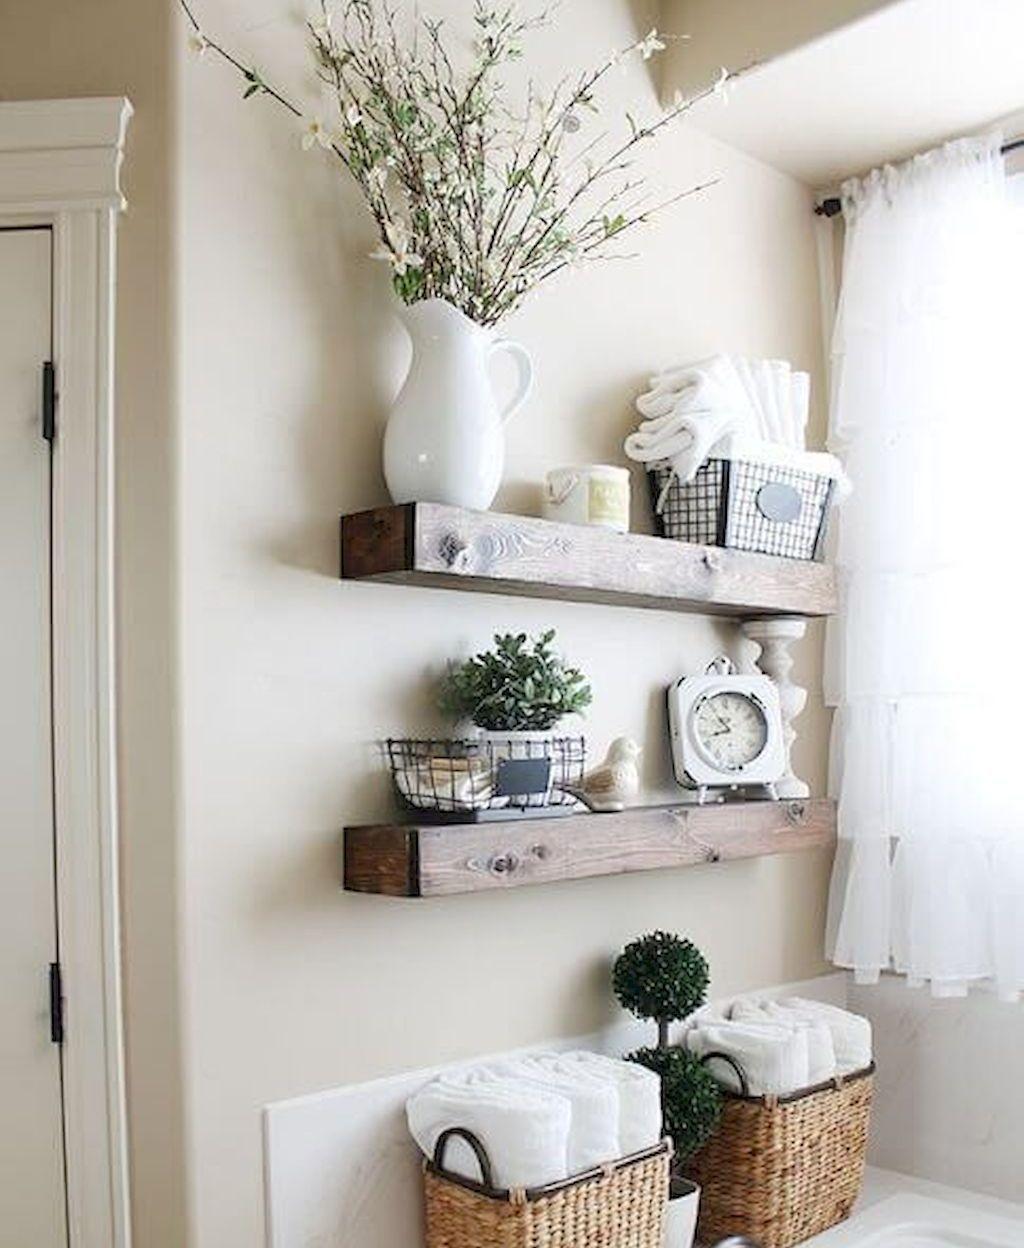 Home Design Ideas Classy: 96 Elegant Farmhouse Decor Ideas